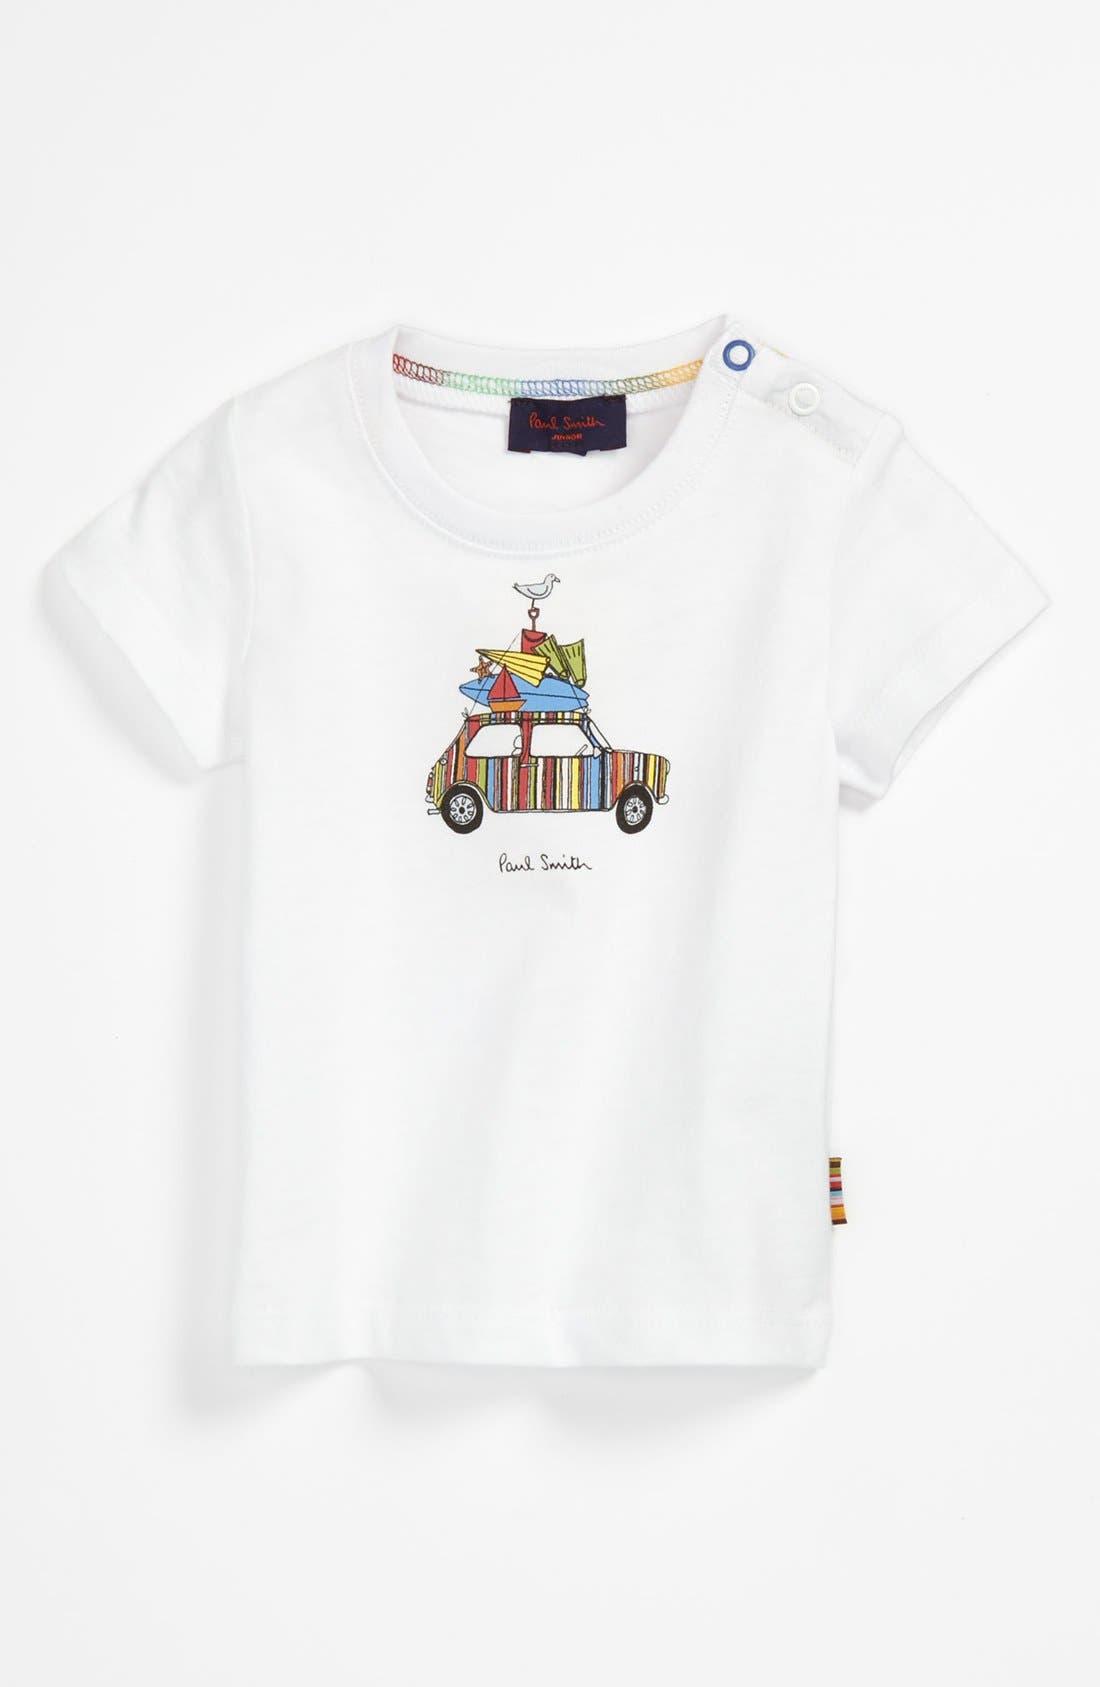 Alternate Image 1 Selected - Paul Smith Junior 'Car' T-Shirt (Toddler)